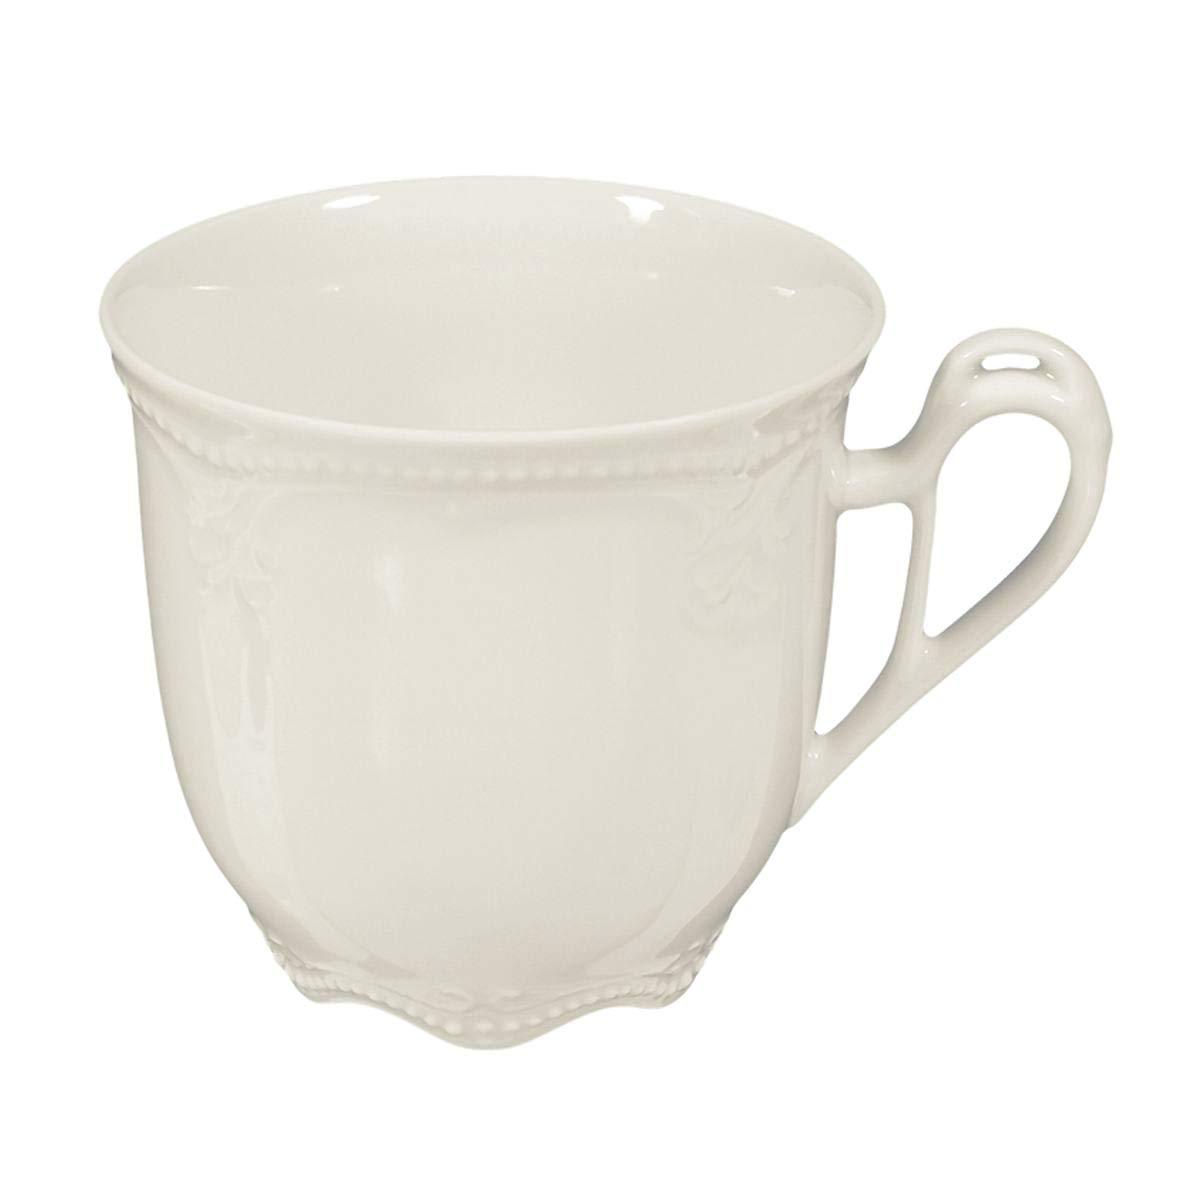 Seltmann Weiden 001.738188 Rubin Cream Kaffeekanne 1,1 L